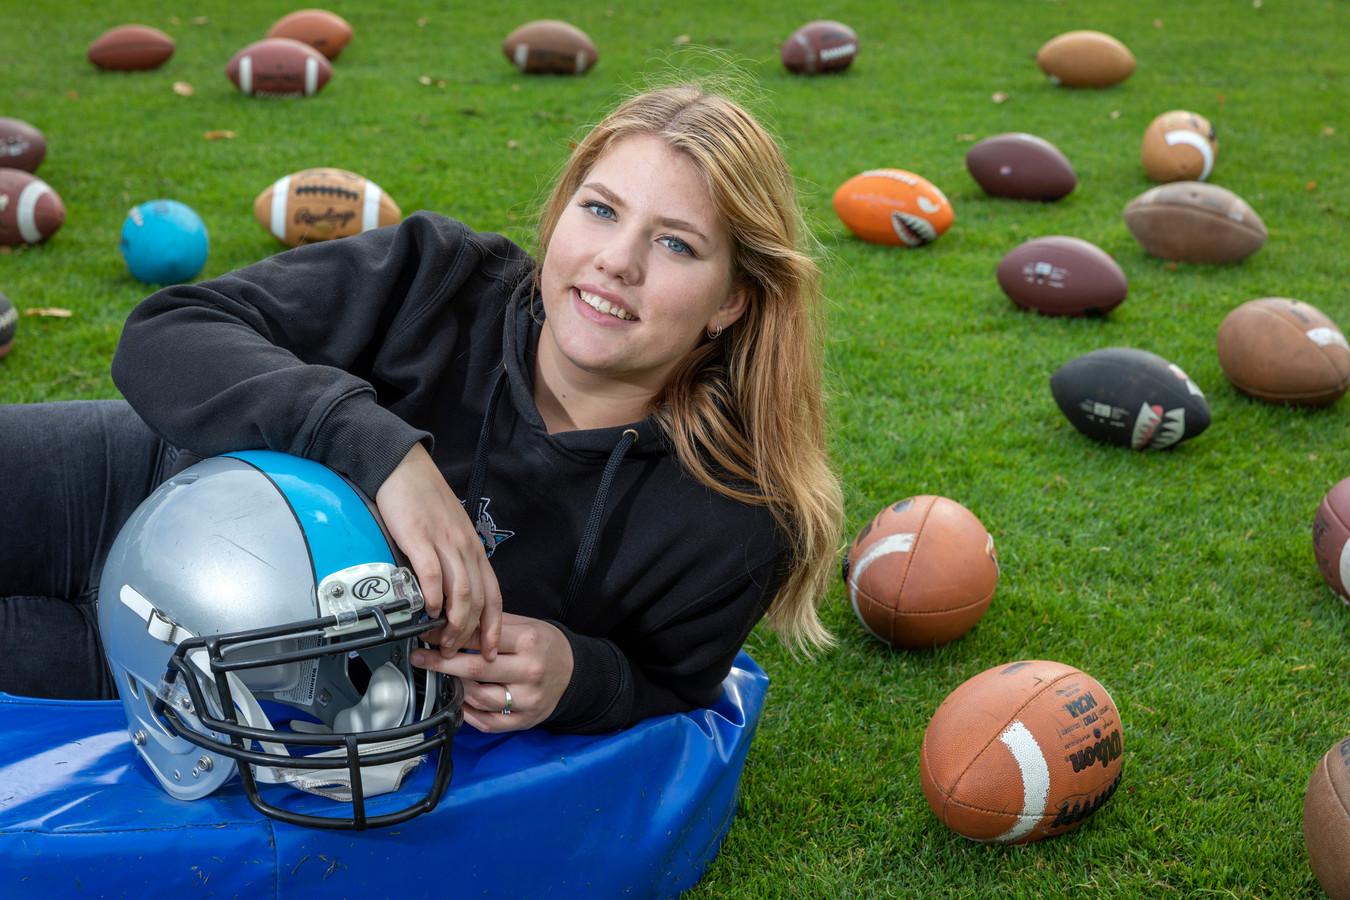 Demie Jolie van de American footballclub Tilburg Wolves.